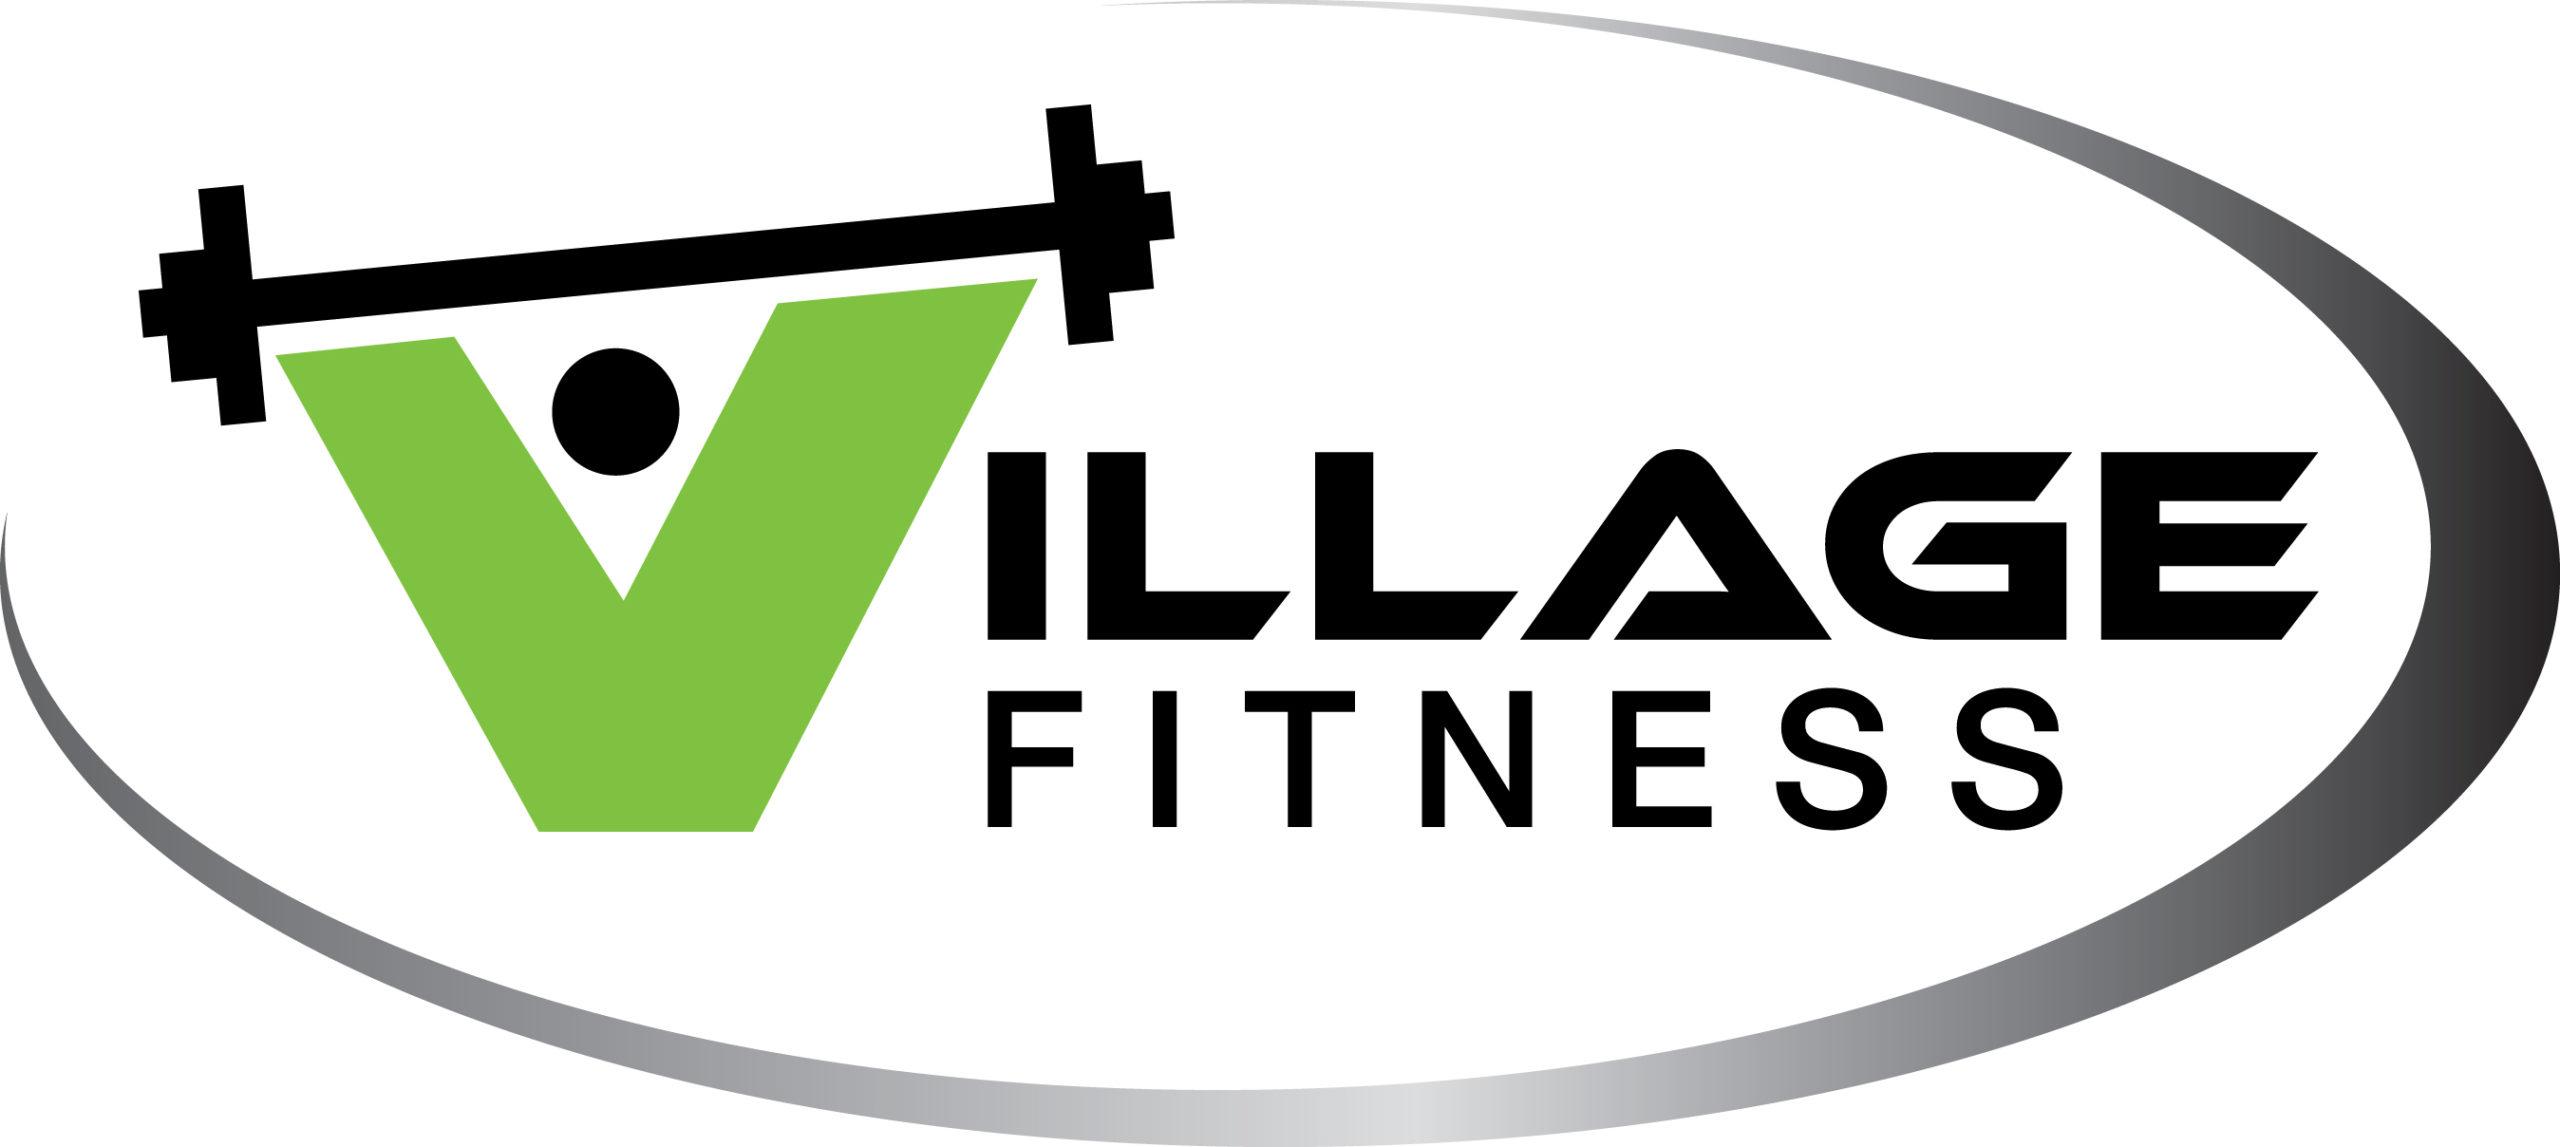 Village Fitness